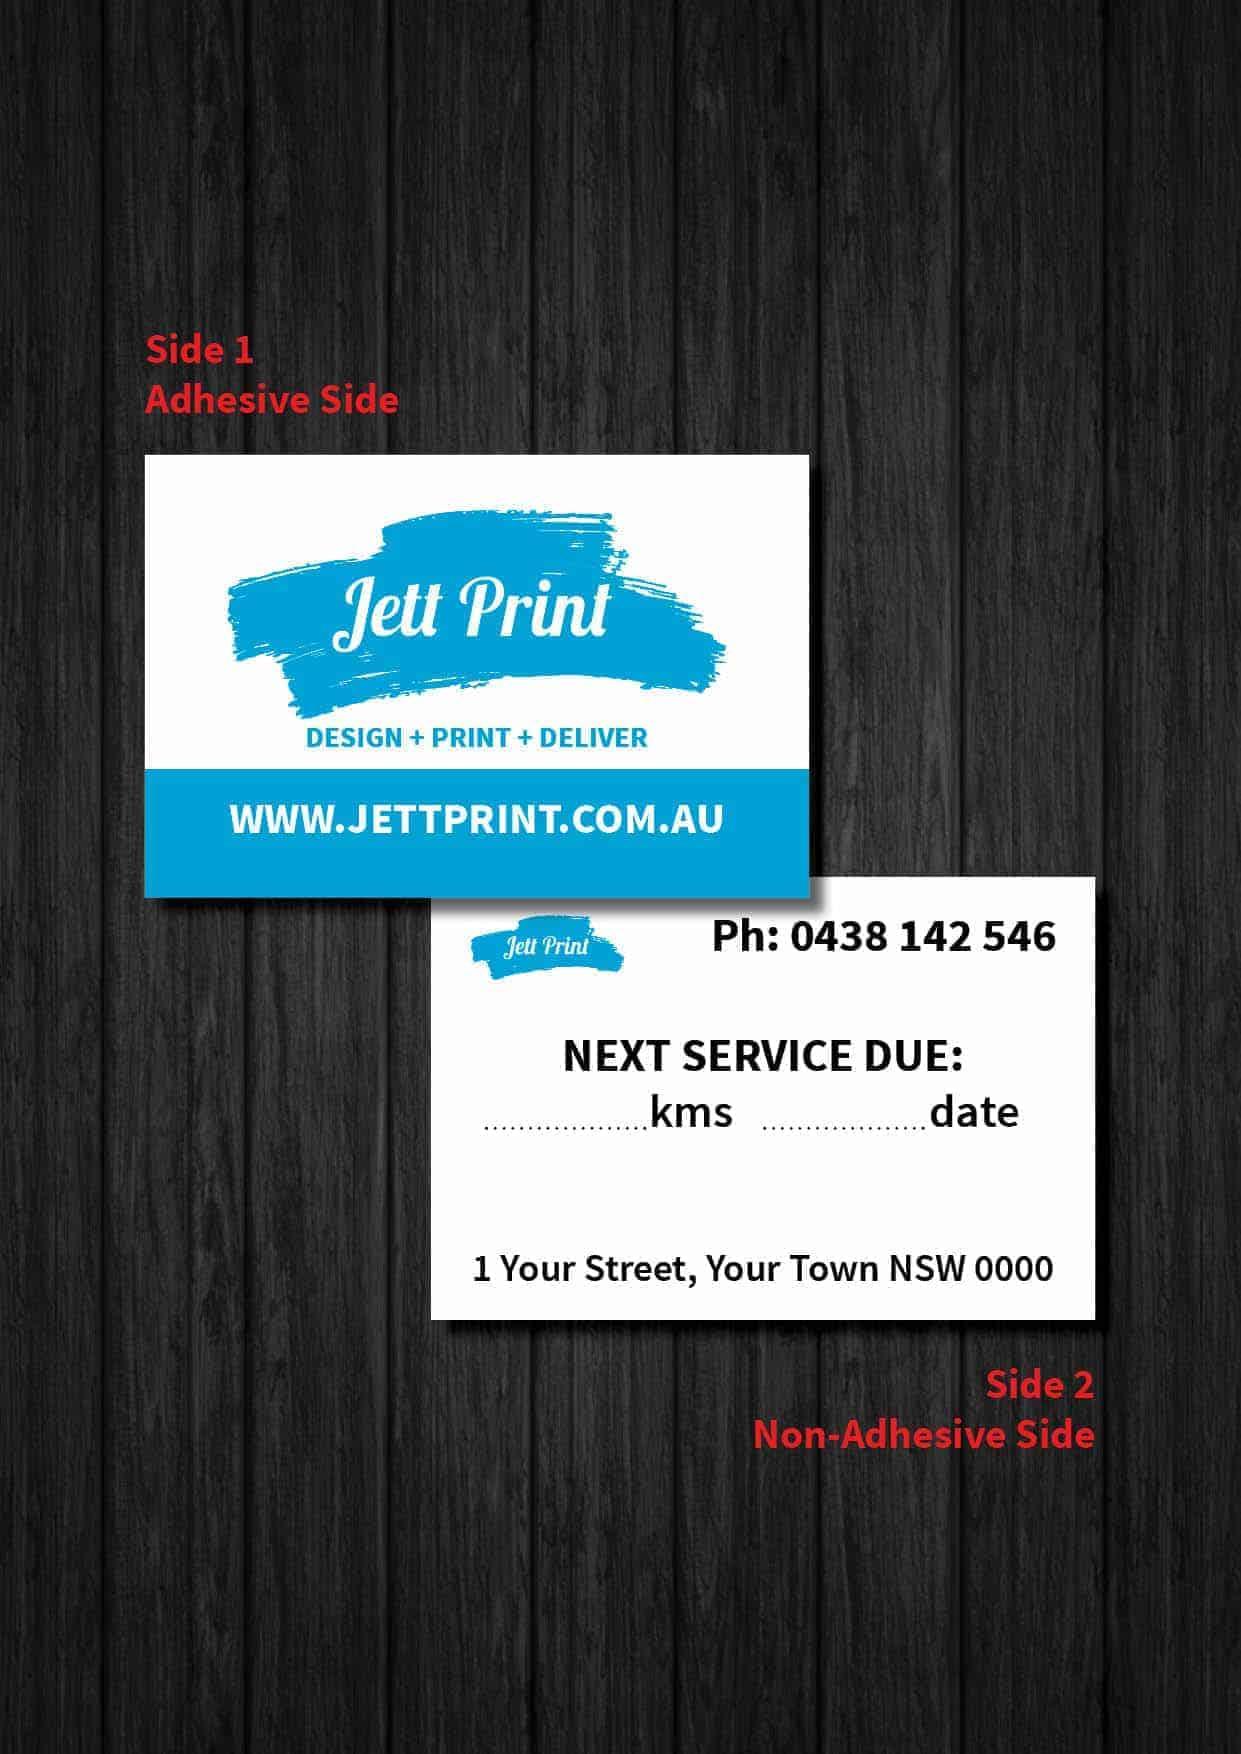 Car Service Stickers Printed Delivered Australia Wide